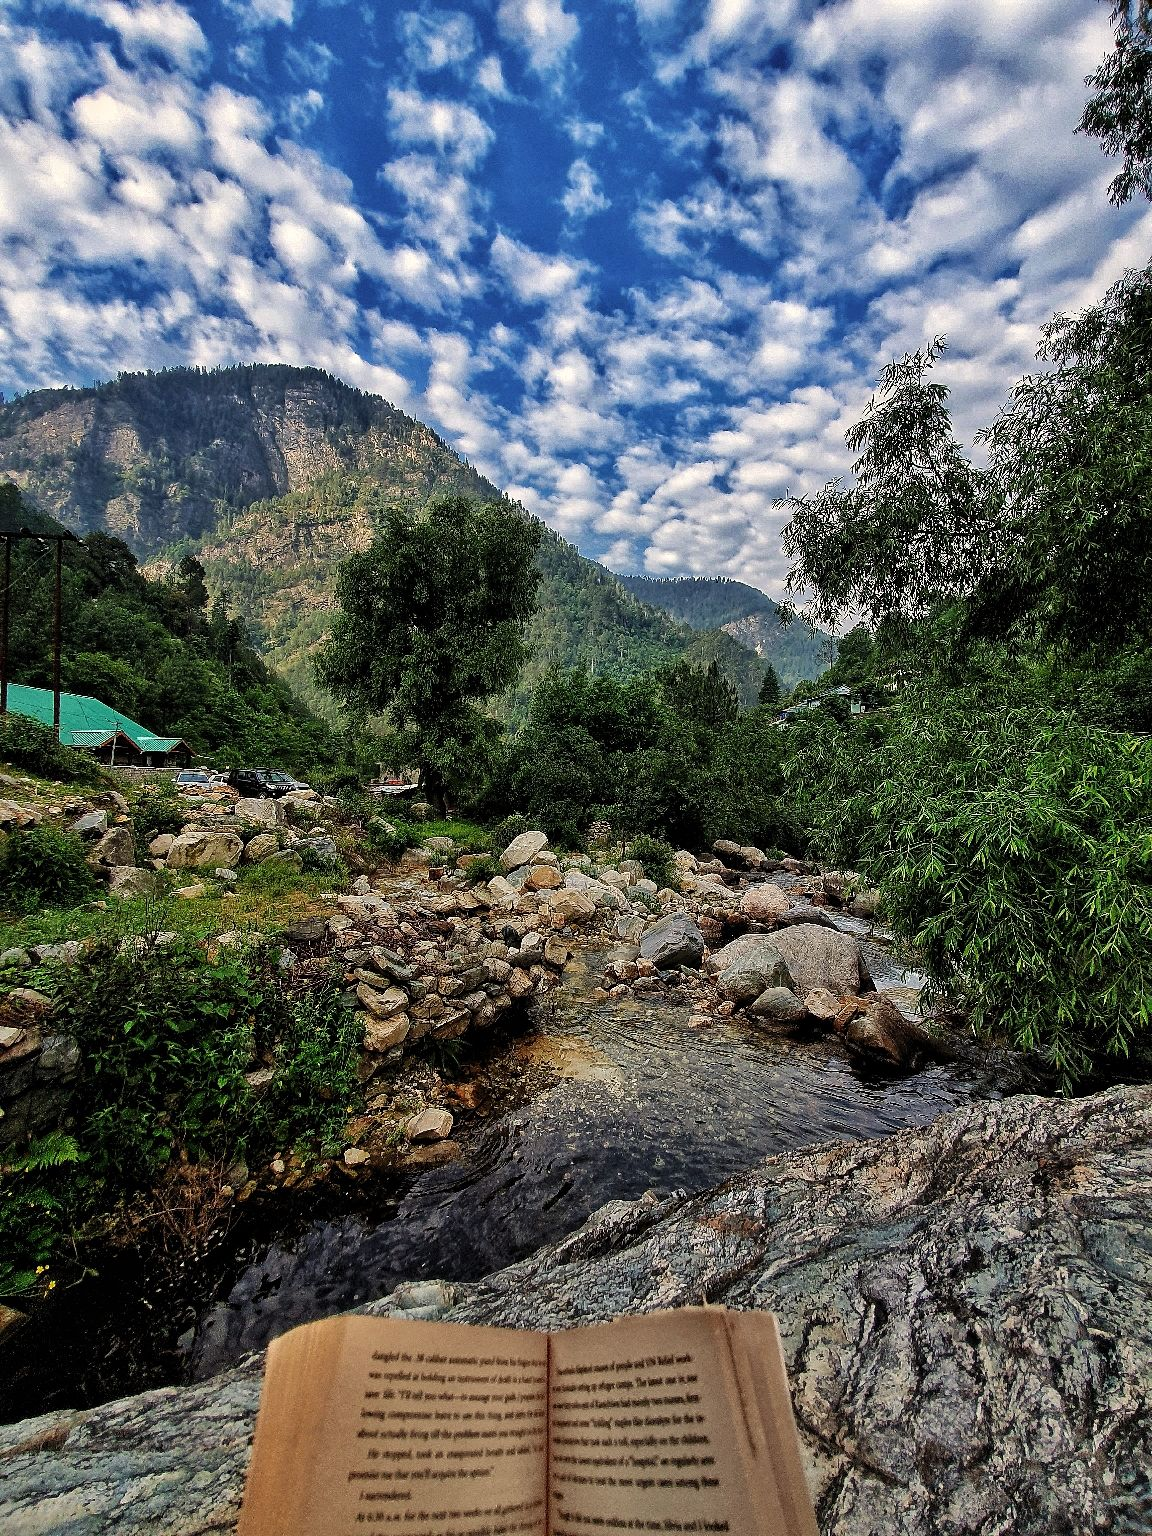 Photo of Gone Fishing Cottages By Lakshya pawa